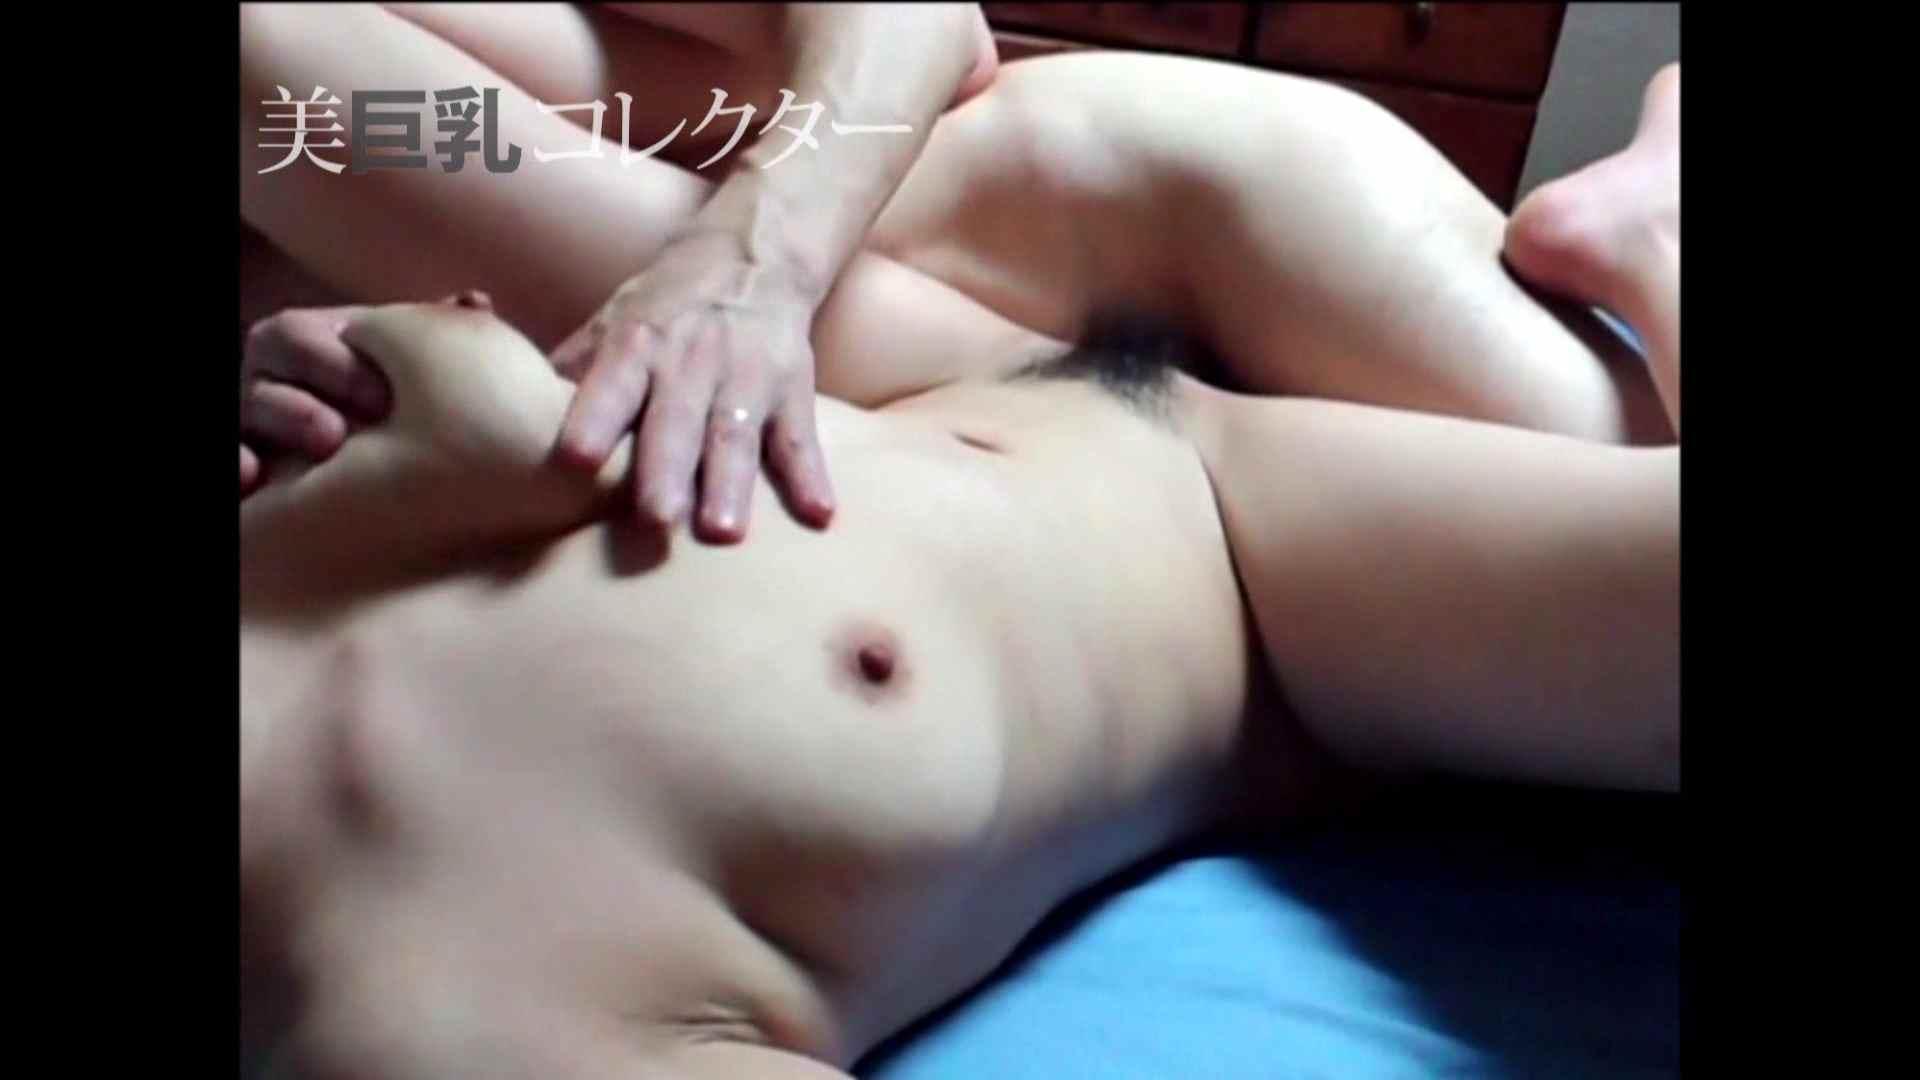 泥酔スレンダー巨乳美女2 巨乳女子 盗撮動画紹介 109pic 80